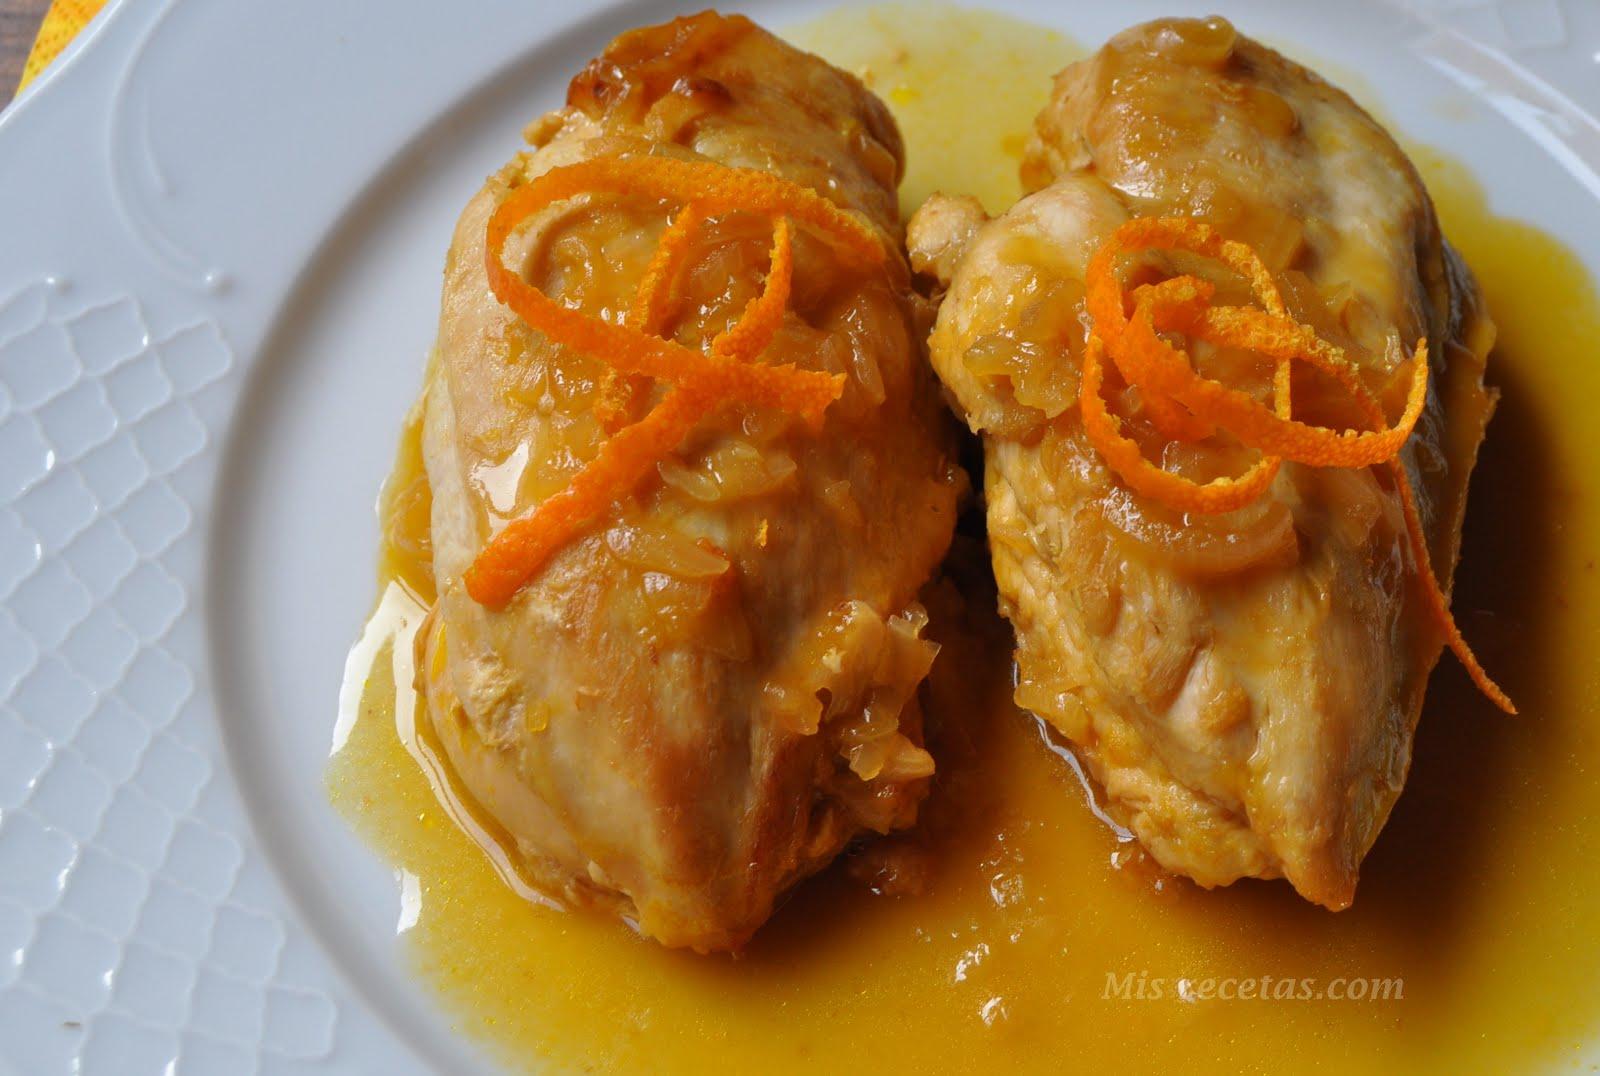 MIS RECETAS. COM: Pechugas de pollo a la naranja